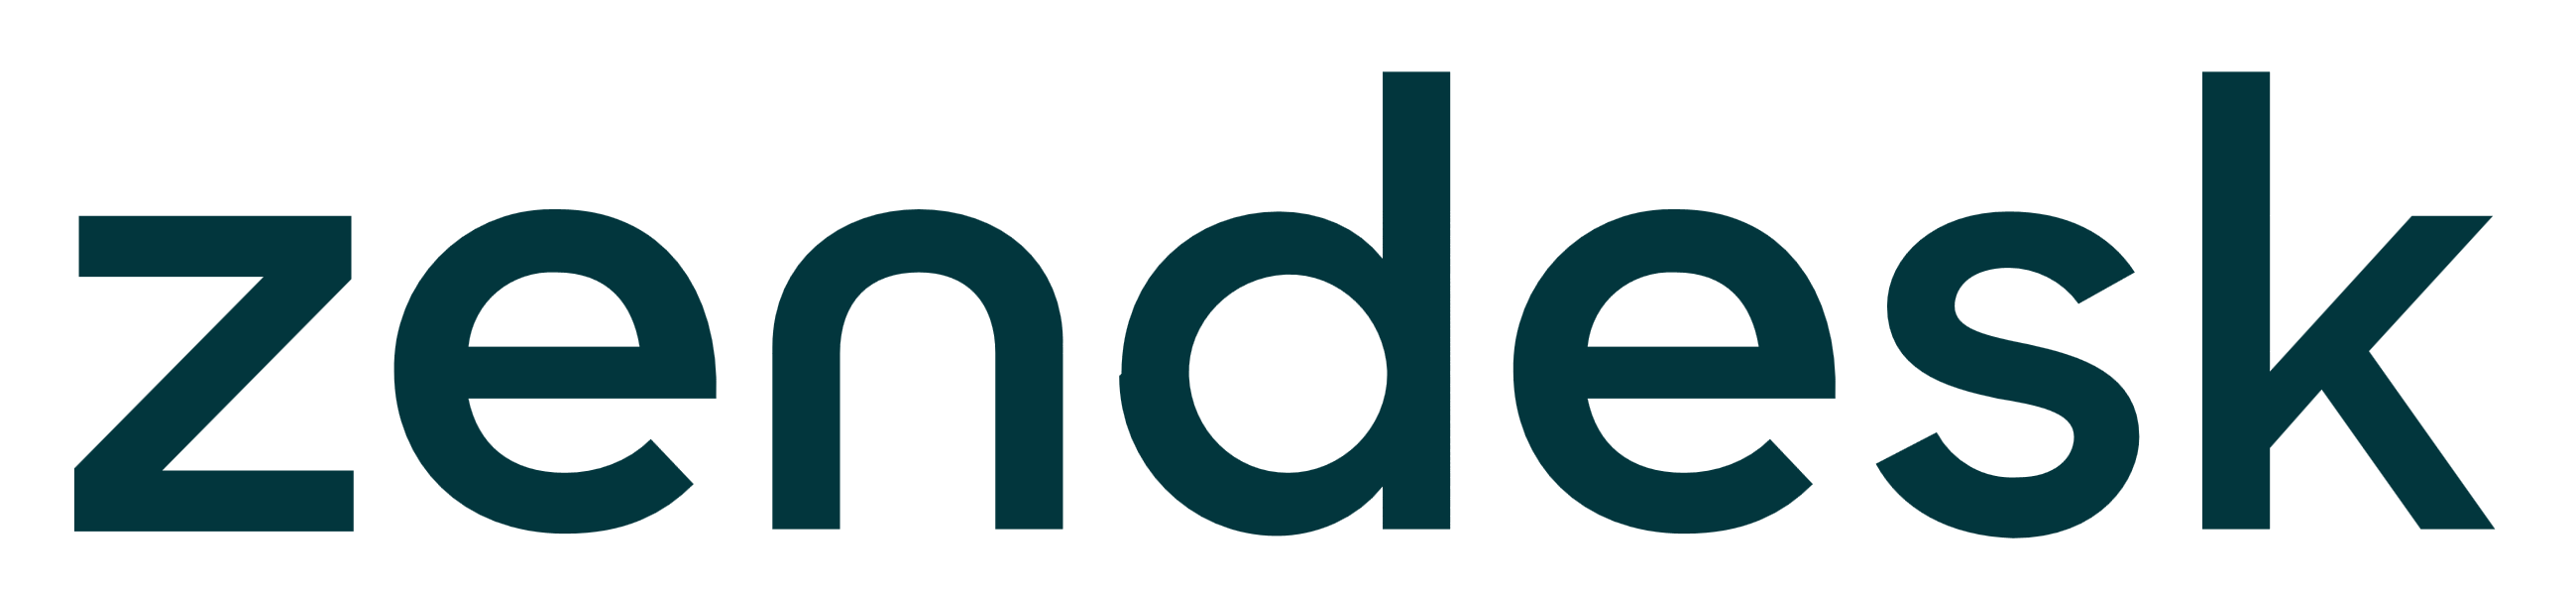 Zendesk_logo_wordmark